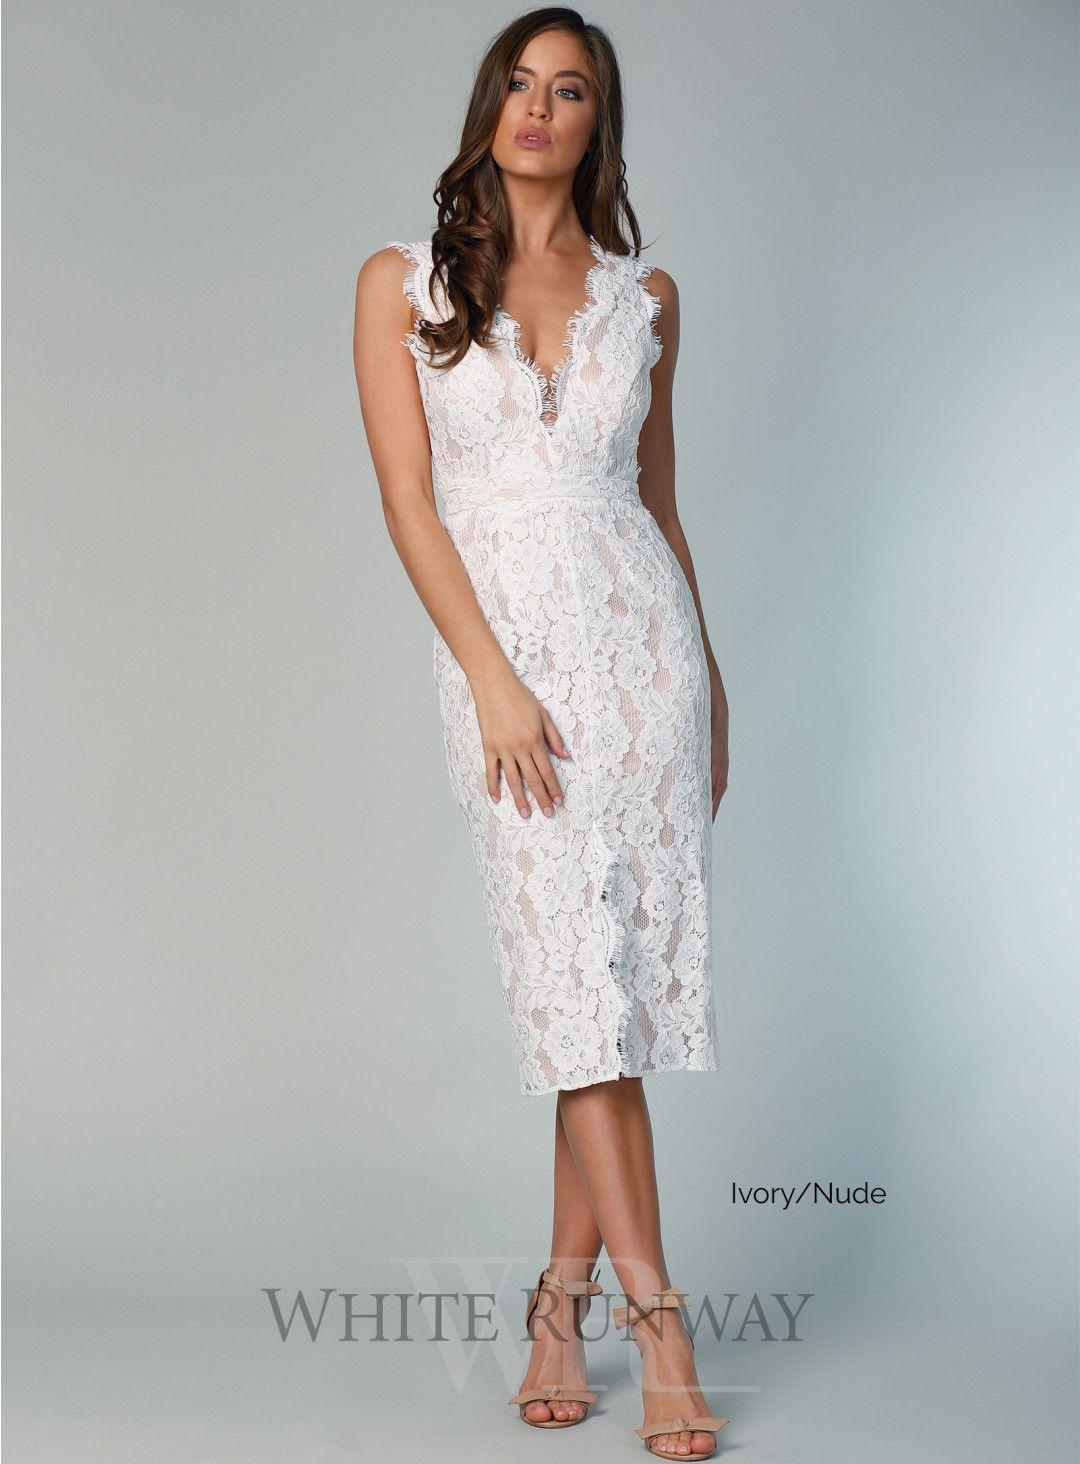 Willa Cocktail Dress Cocktail Dress Wedding Bridal Shower Dress Party Dress [ 1464 x 1080 Pixel ]